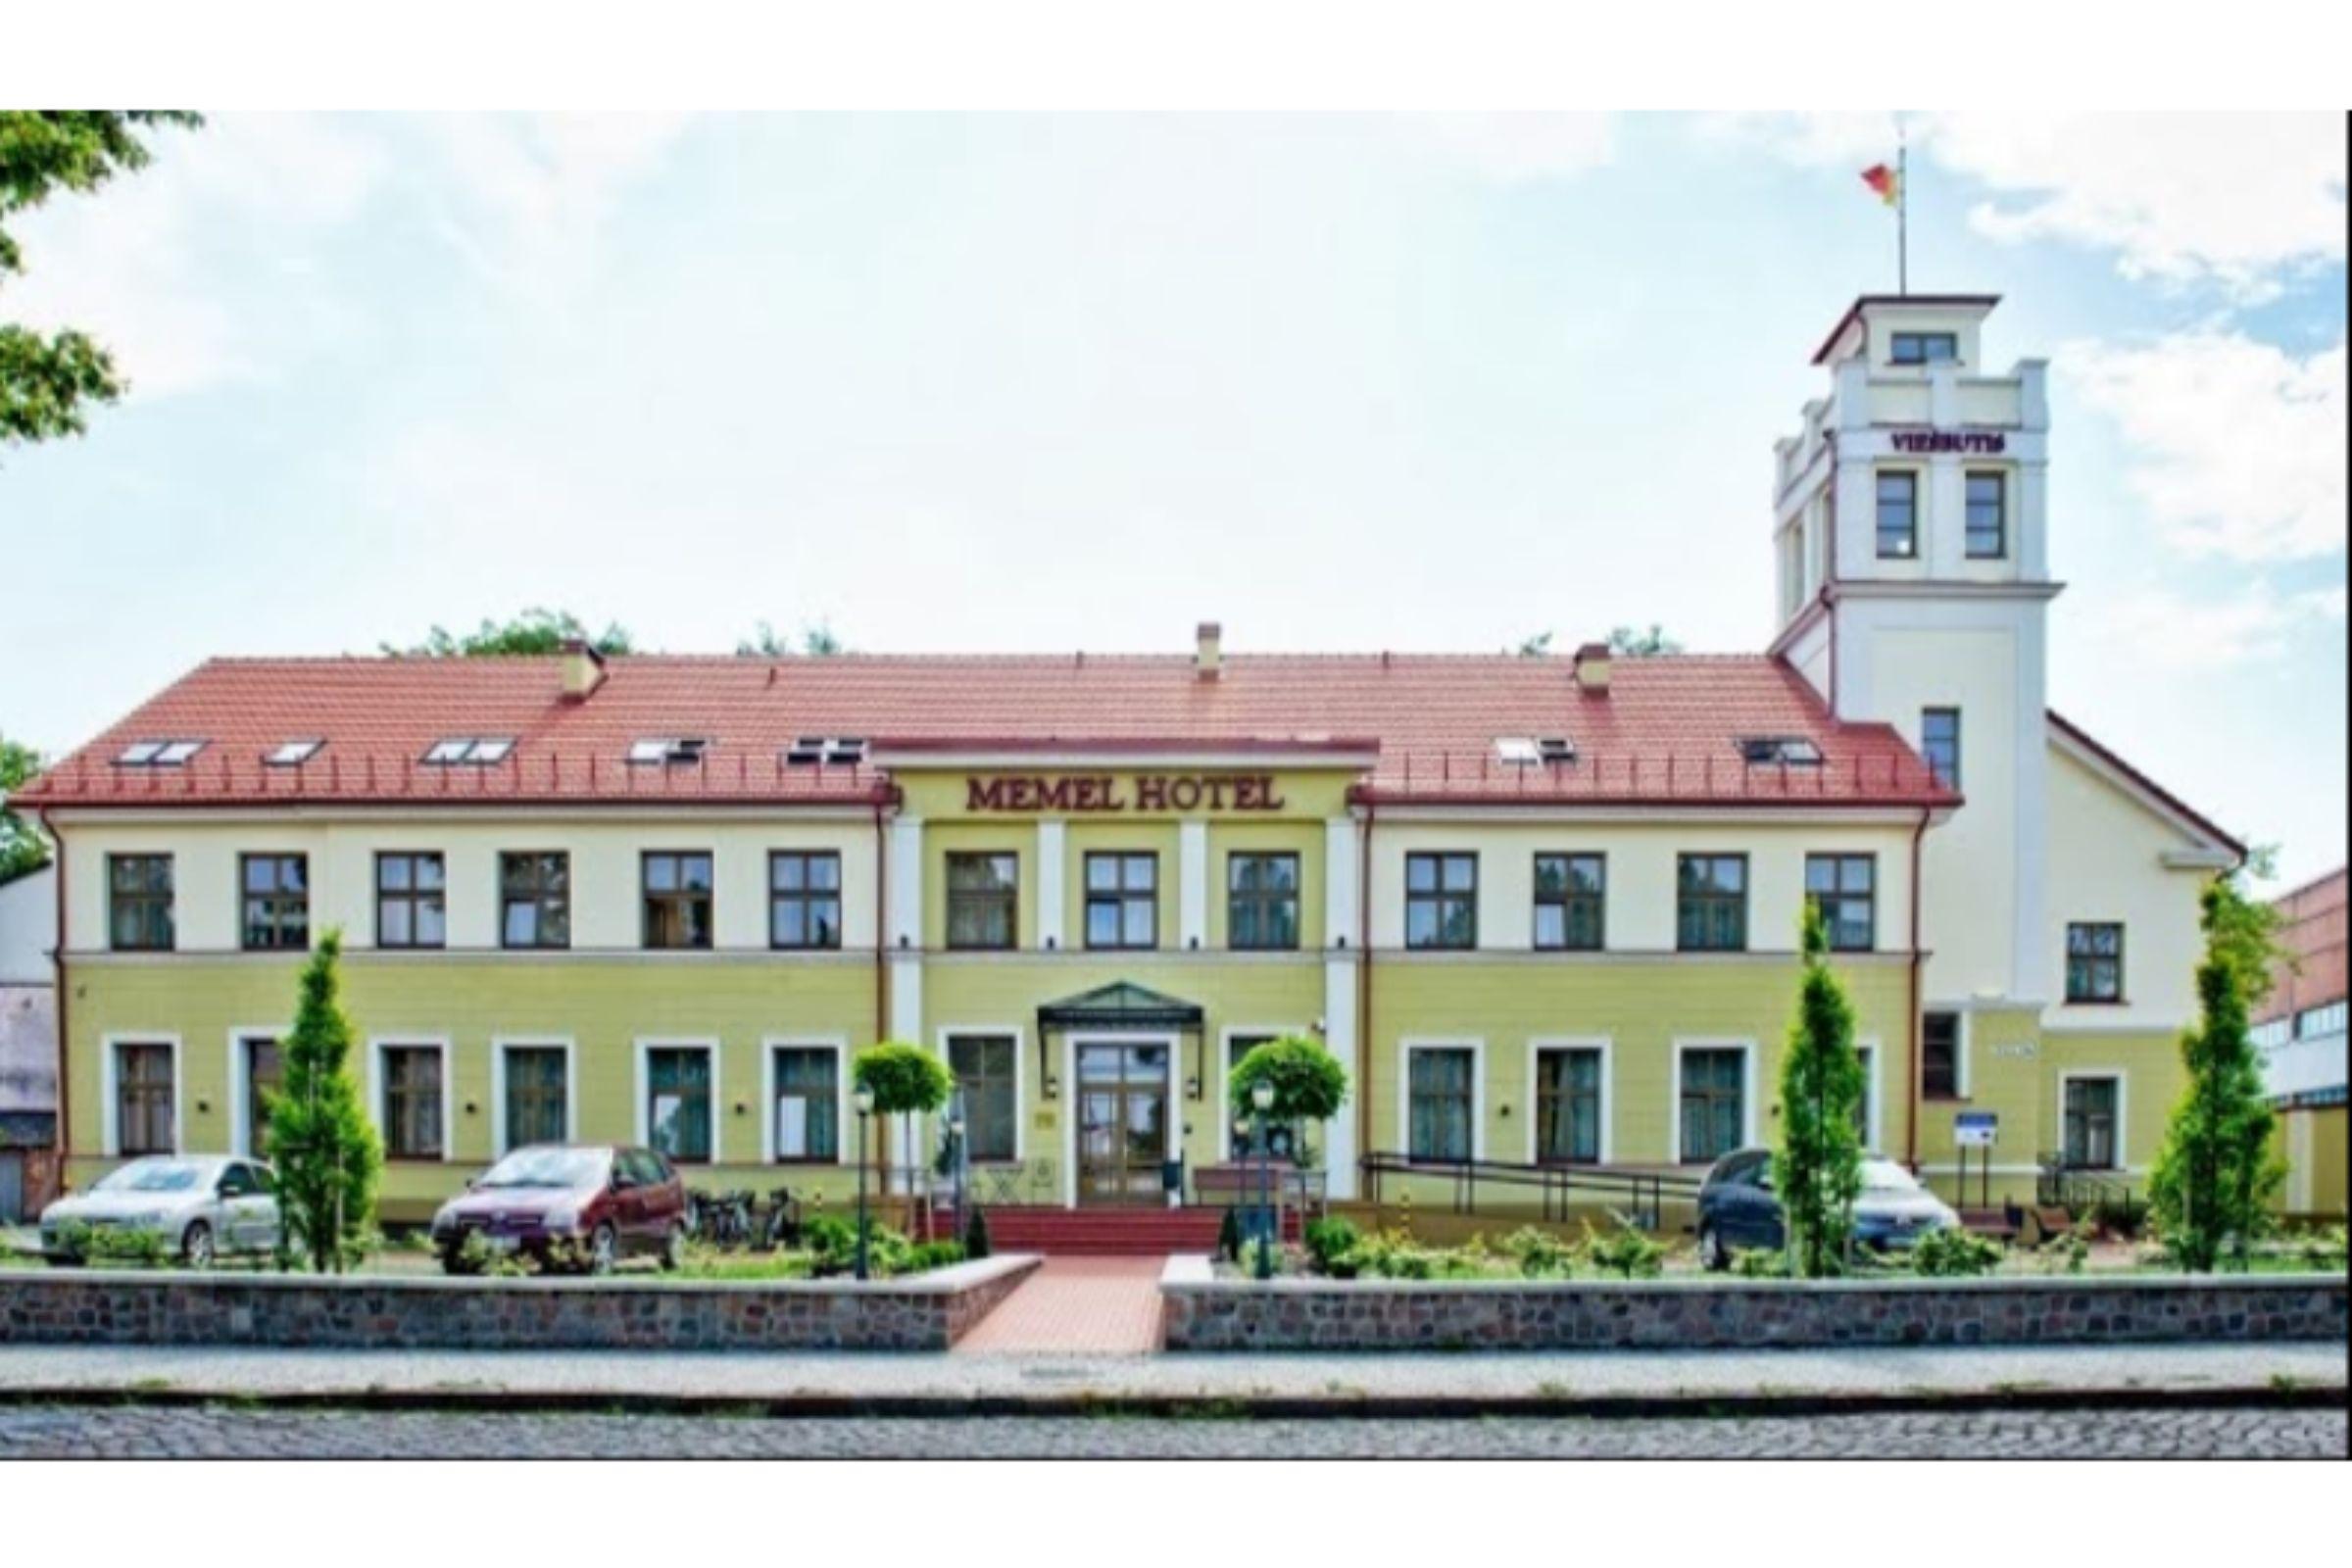 Memel Hotel, Klaipėdos